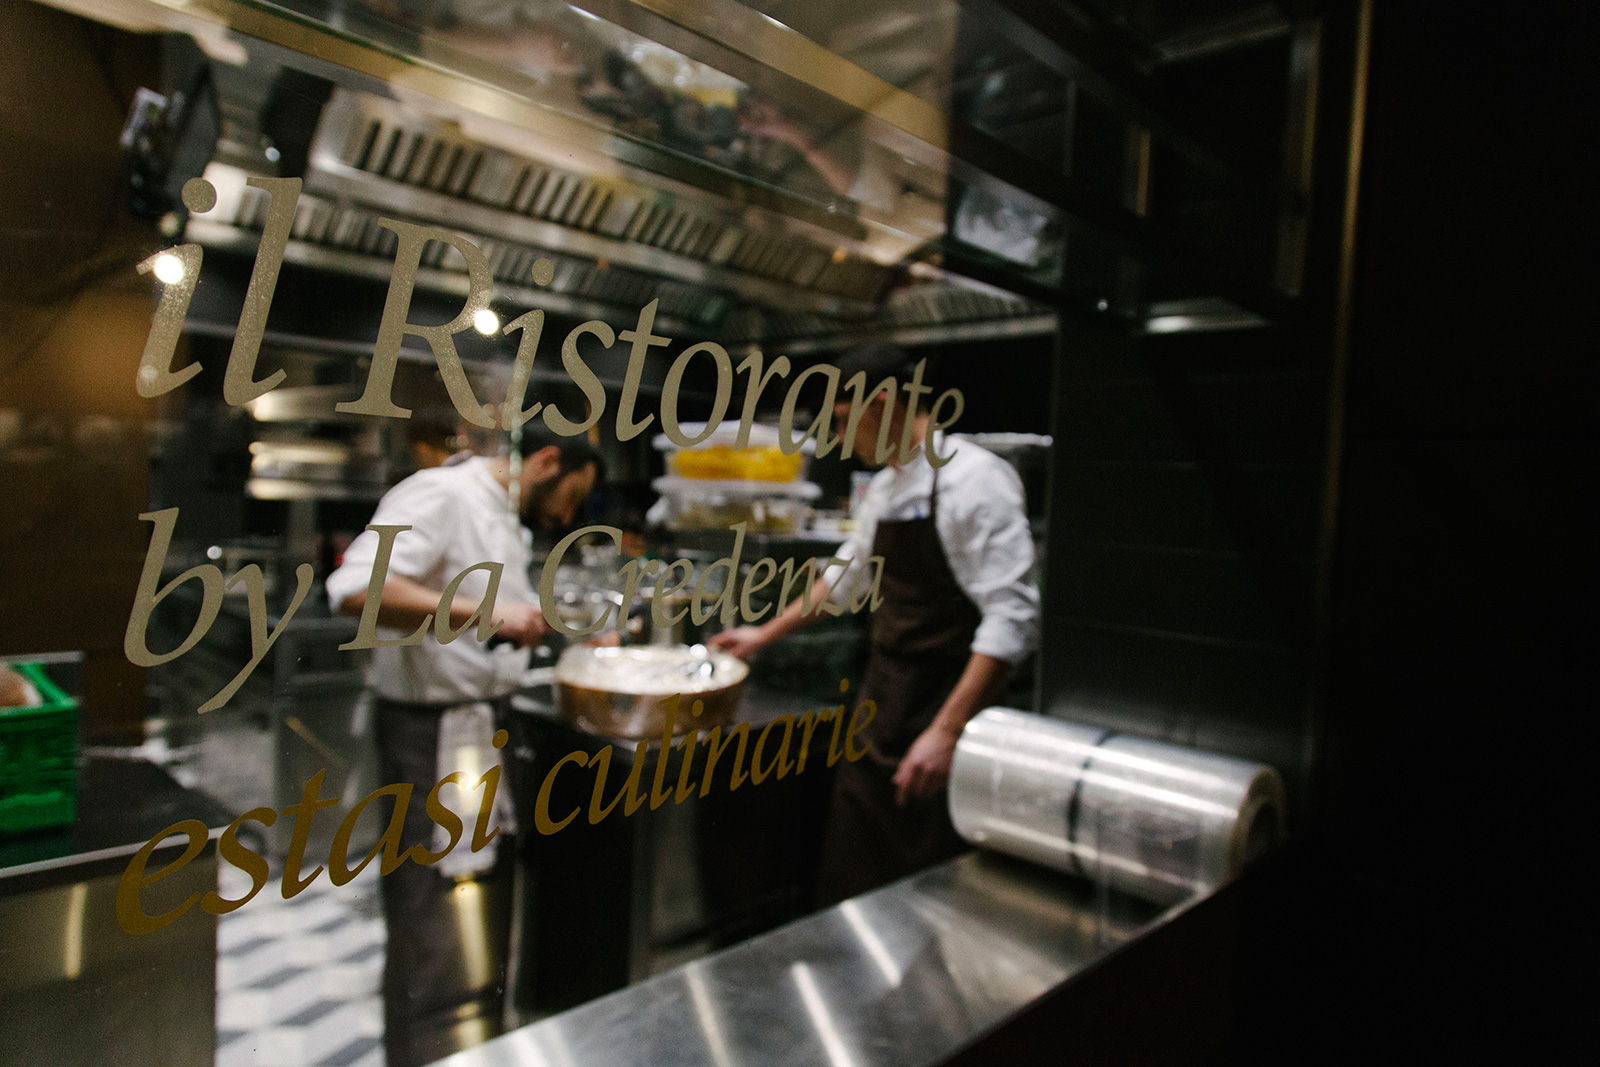 La Credenza Torino Fiorfood : A torino apre fiorfood primo concept store coop agrodolce